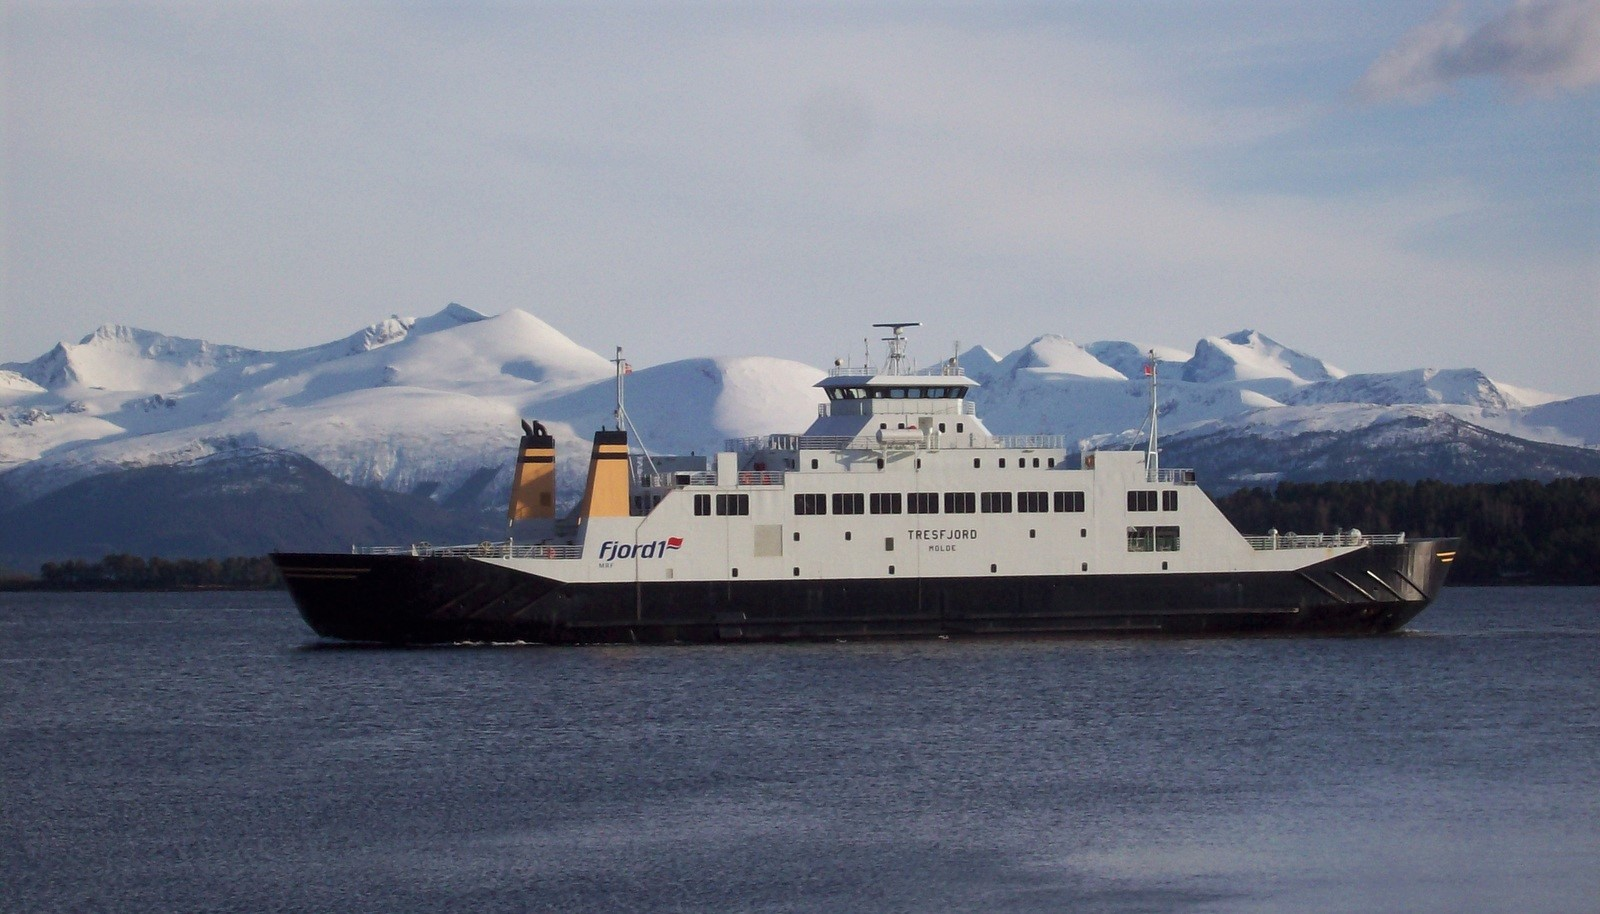 FS Tresfjord